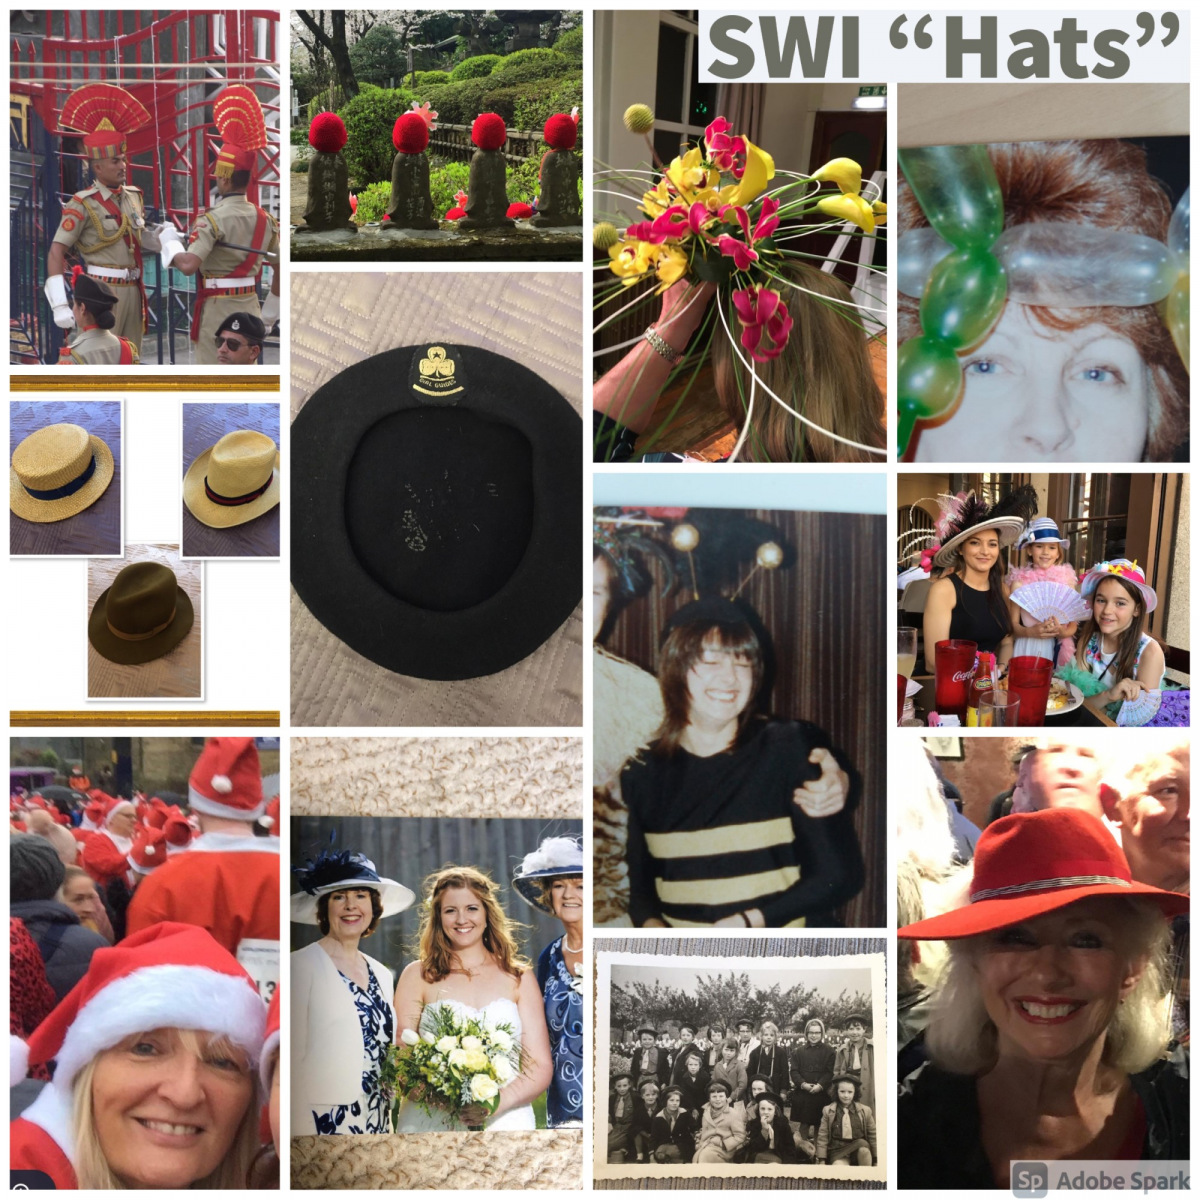 SWI-Hats-part1